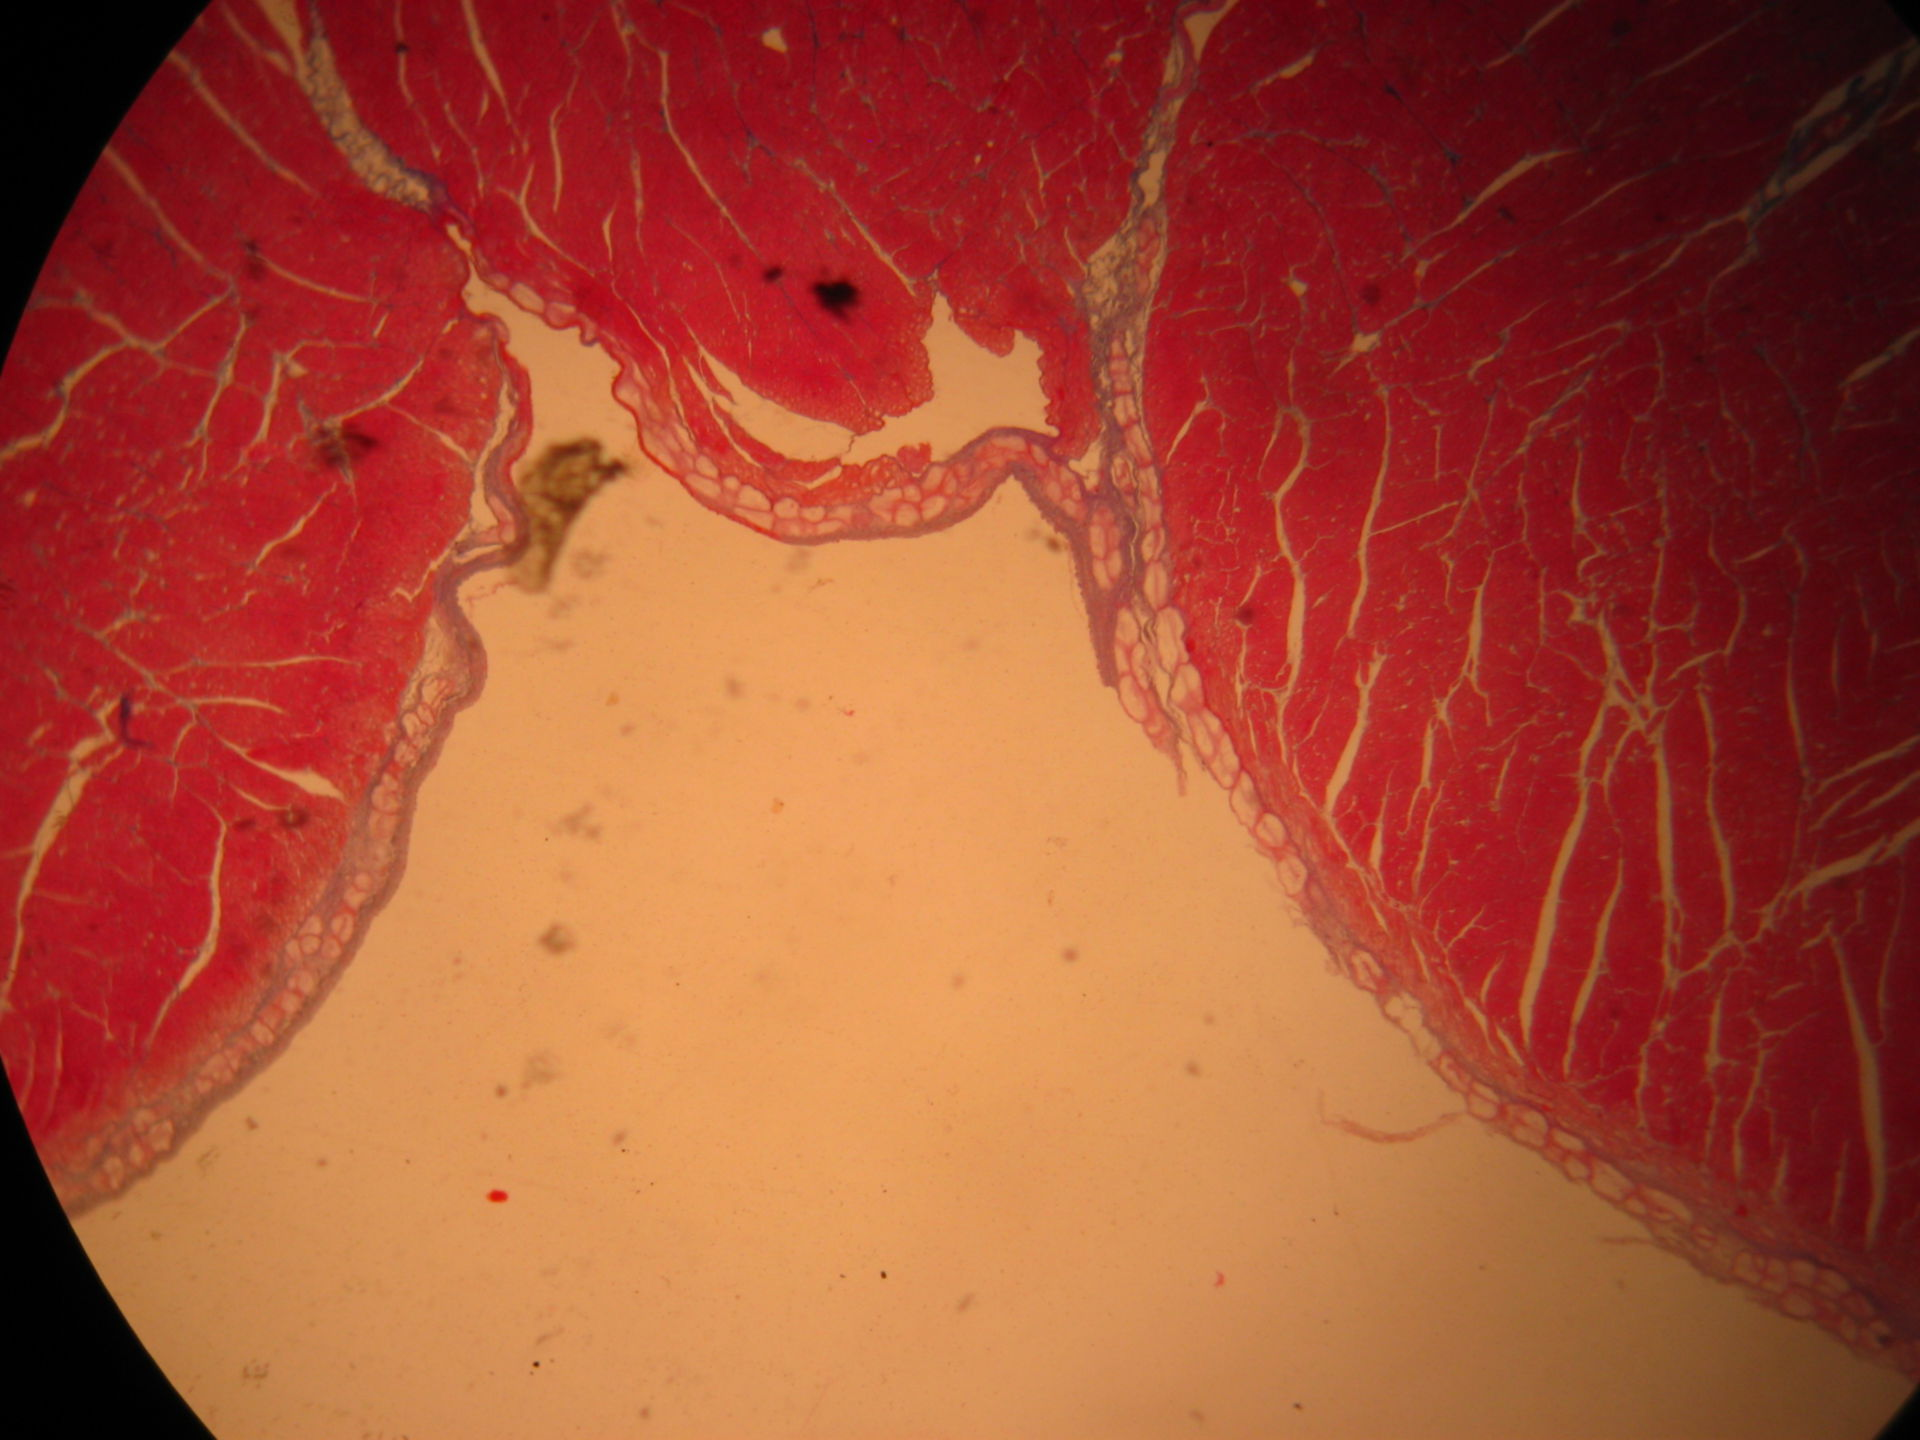 Lumen muscolo cardiaco - maiale